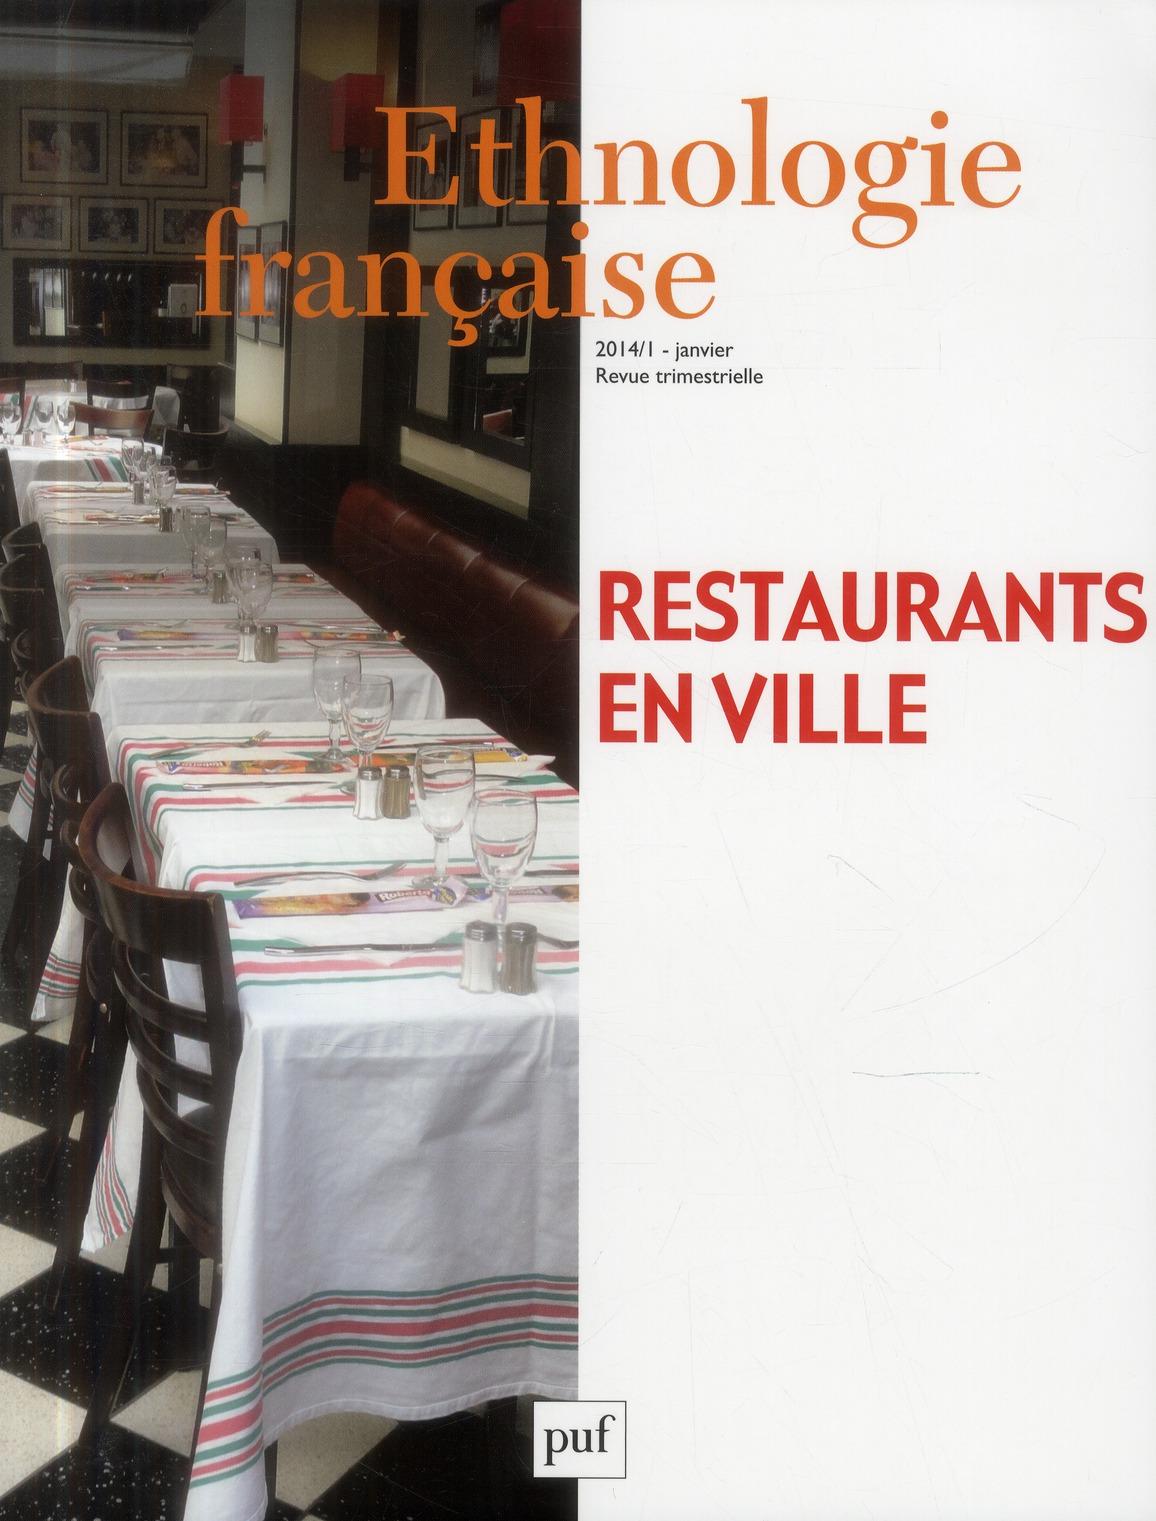 ETHNOLOGIE FRANCAISE 2014, N  1 - RESTAURANTS EN VILLE